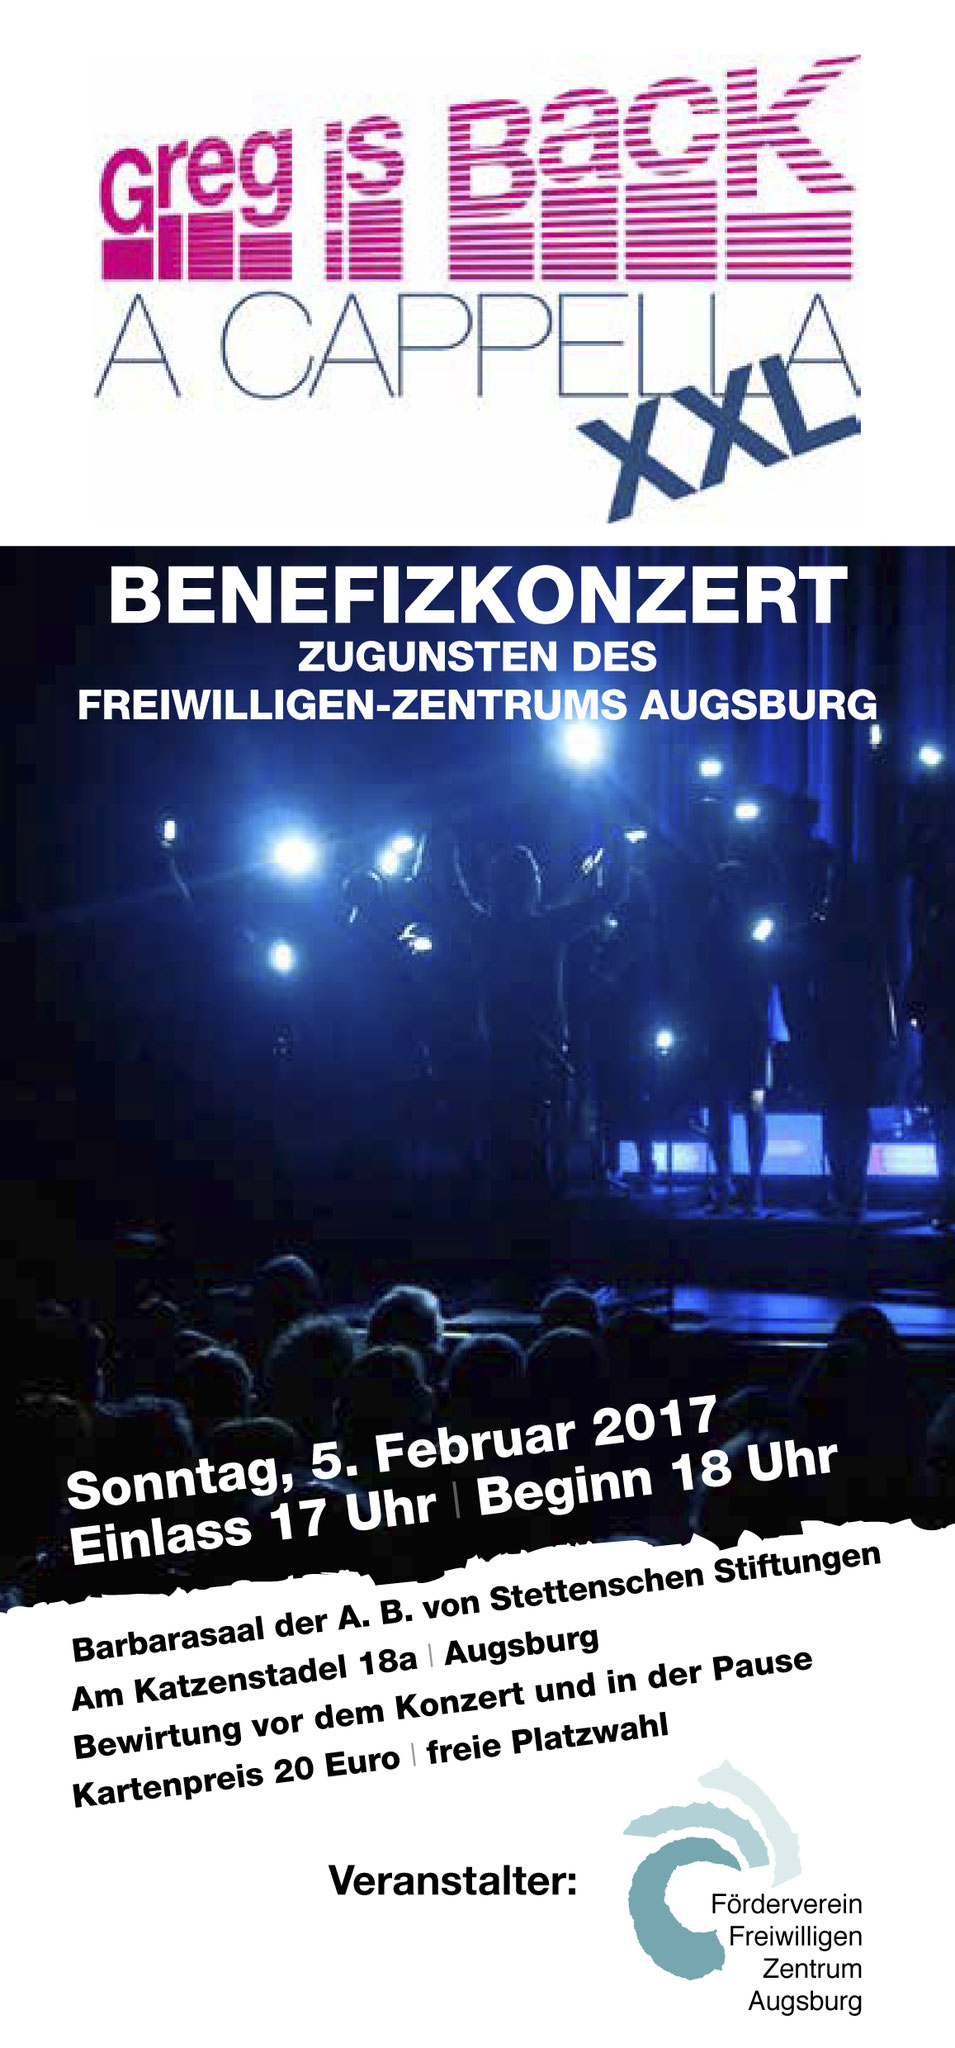 Benefizkonzert zugunsten des Freiwilligen-Zentrum Augsburg Greg is Back - A Cappela XXL Sonntag, 5. Februar 2017 im Barbarasaal